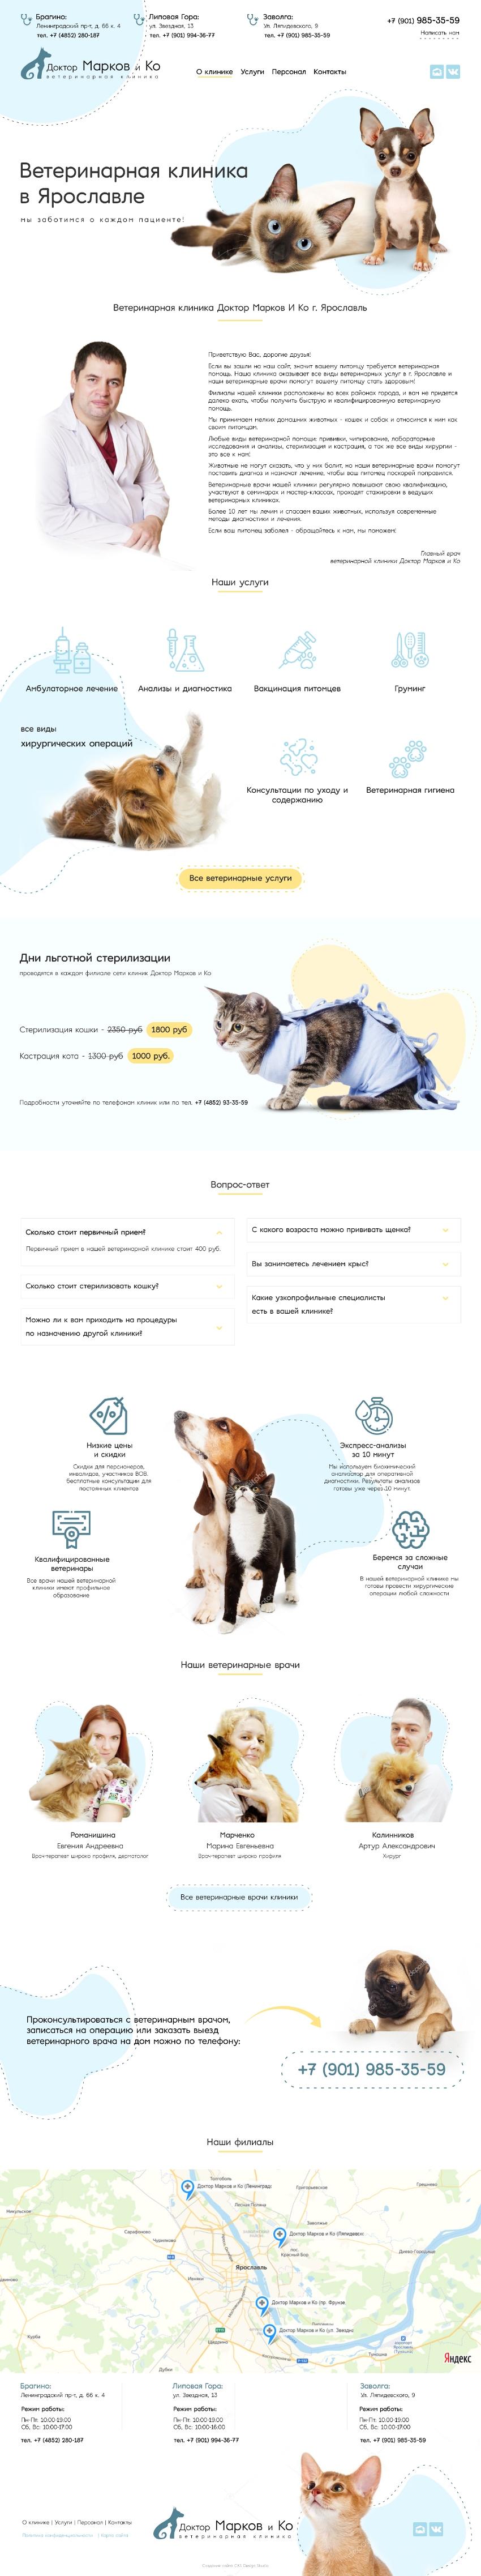 website for veterinary clinic